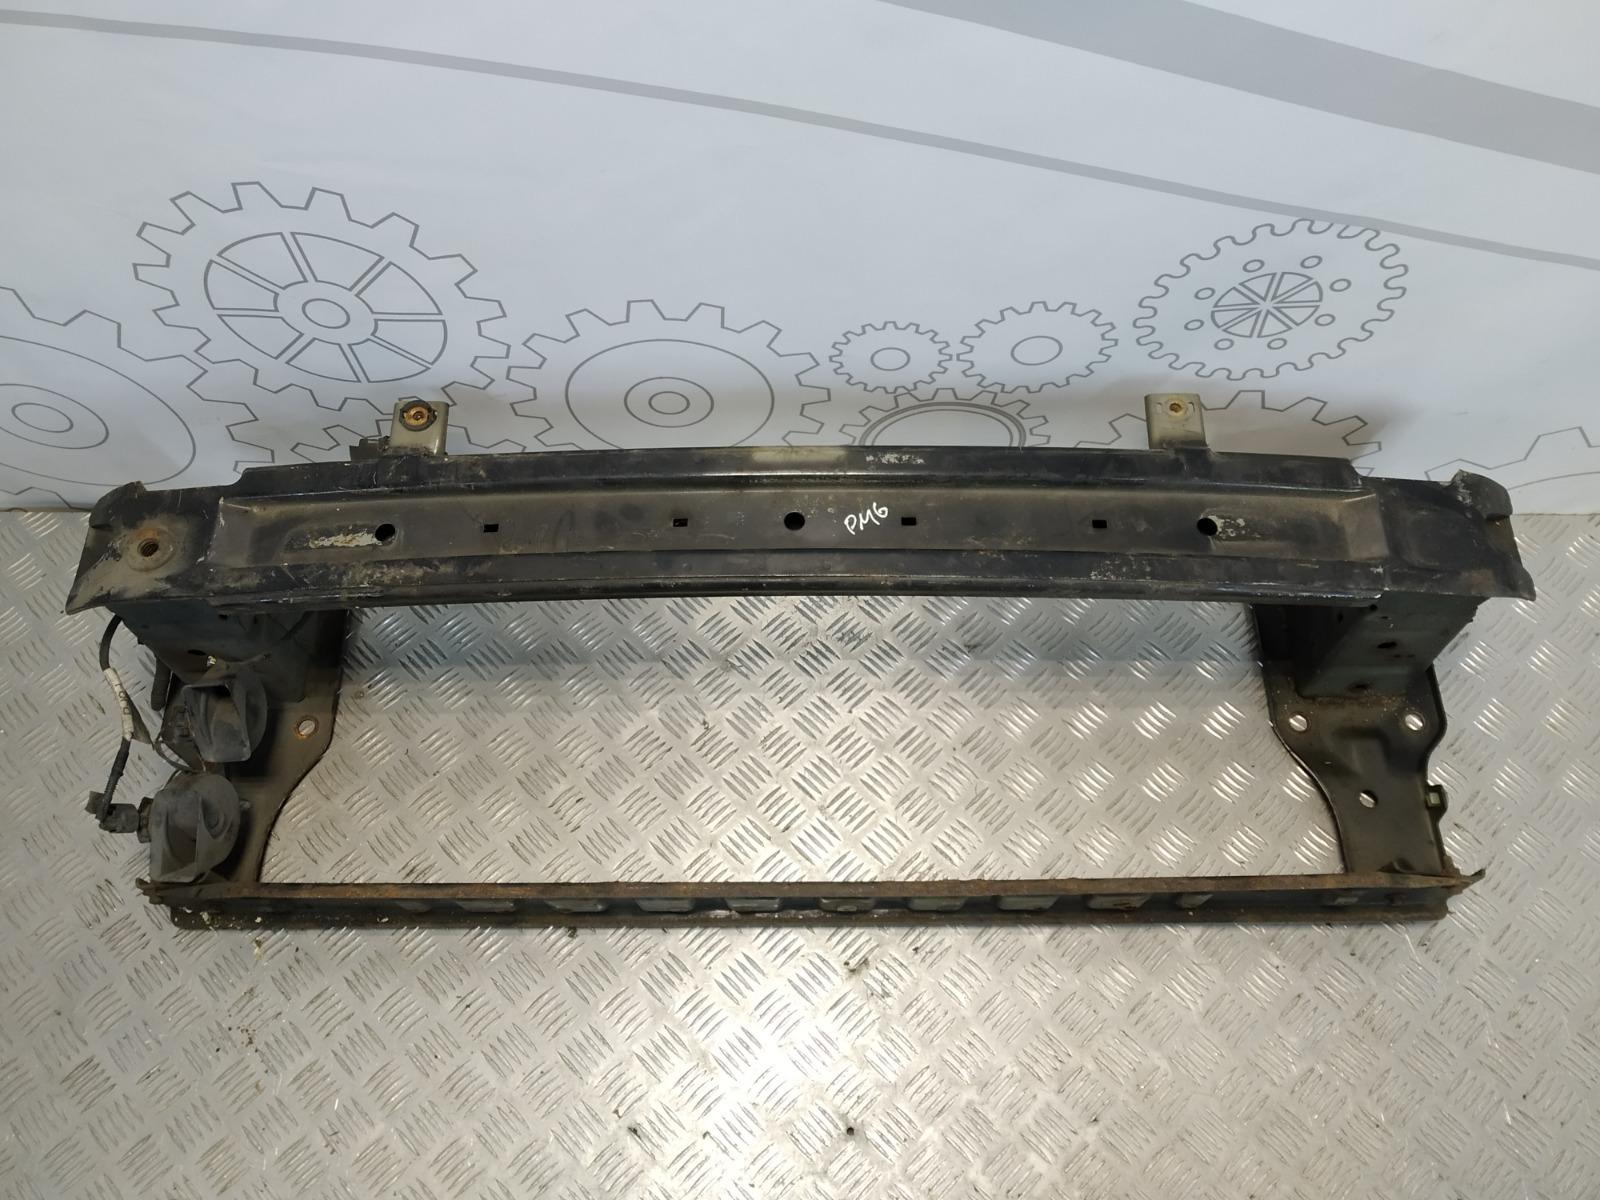 Усилитель бампера переднего Ford Galaxy 2.0 TDCI 2010 (б/у)